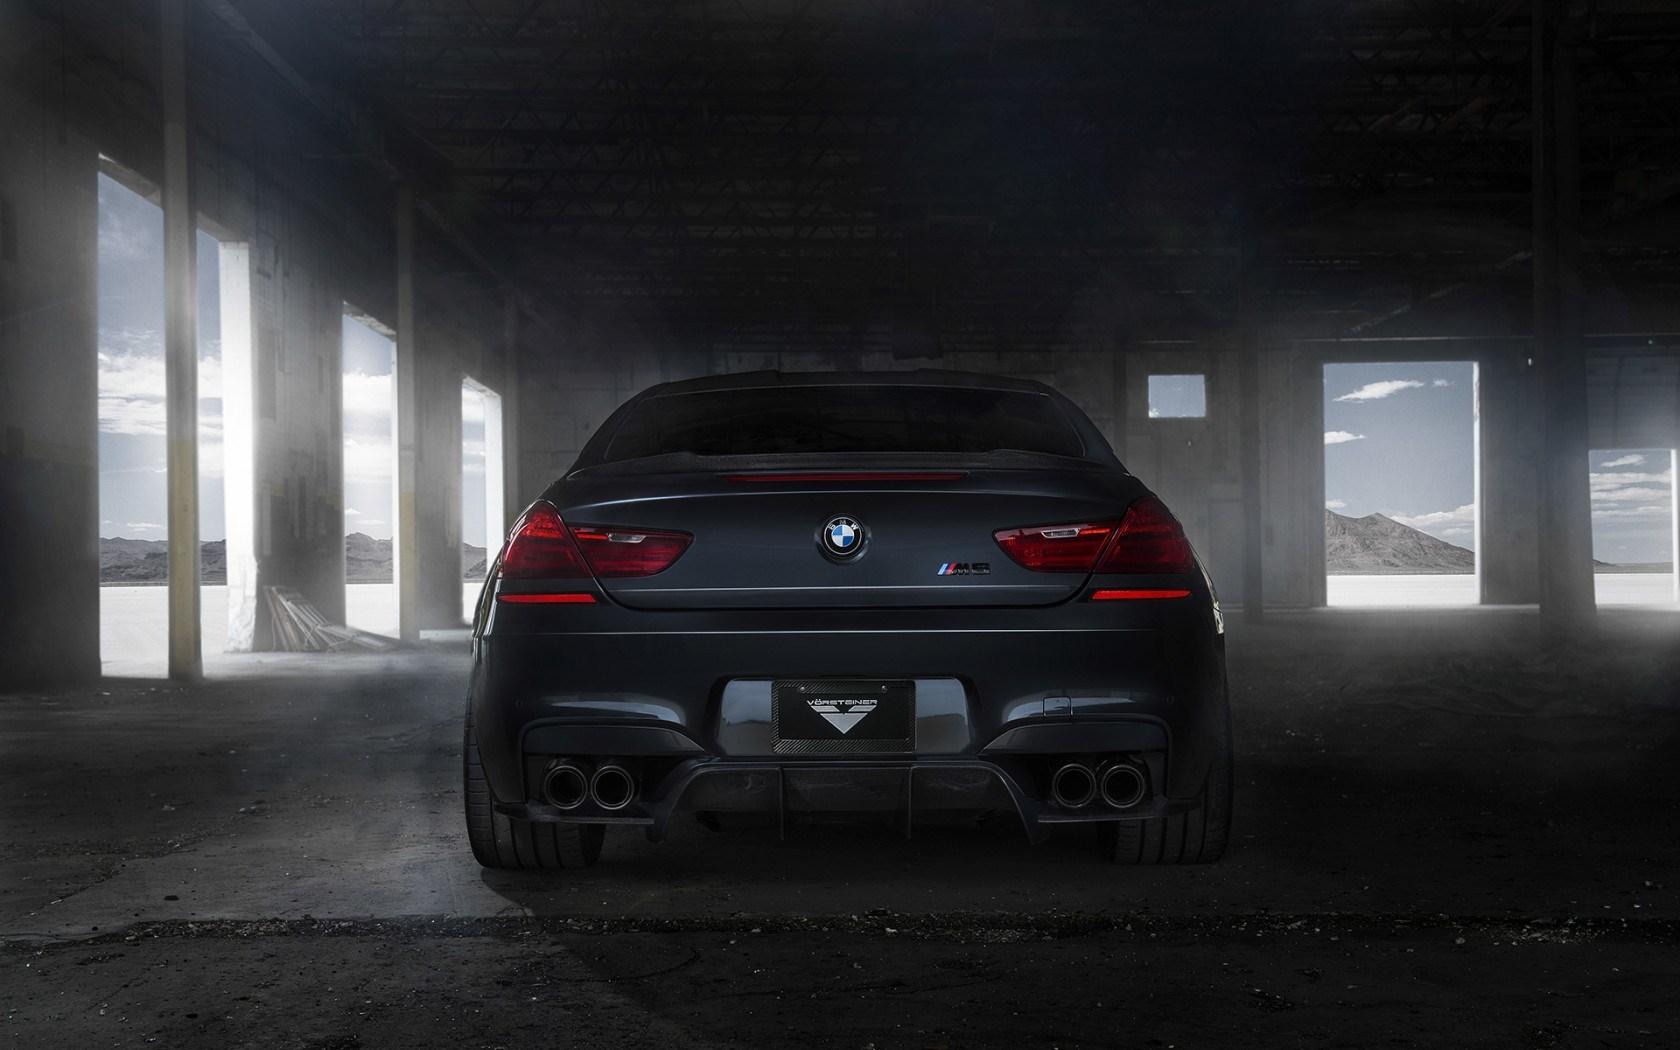 BMW M6 Coupe F13 Black Tuning Car Rear